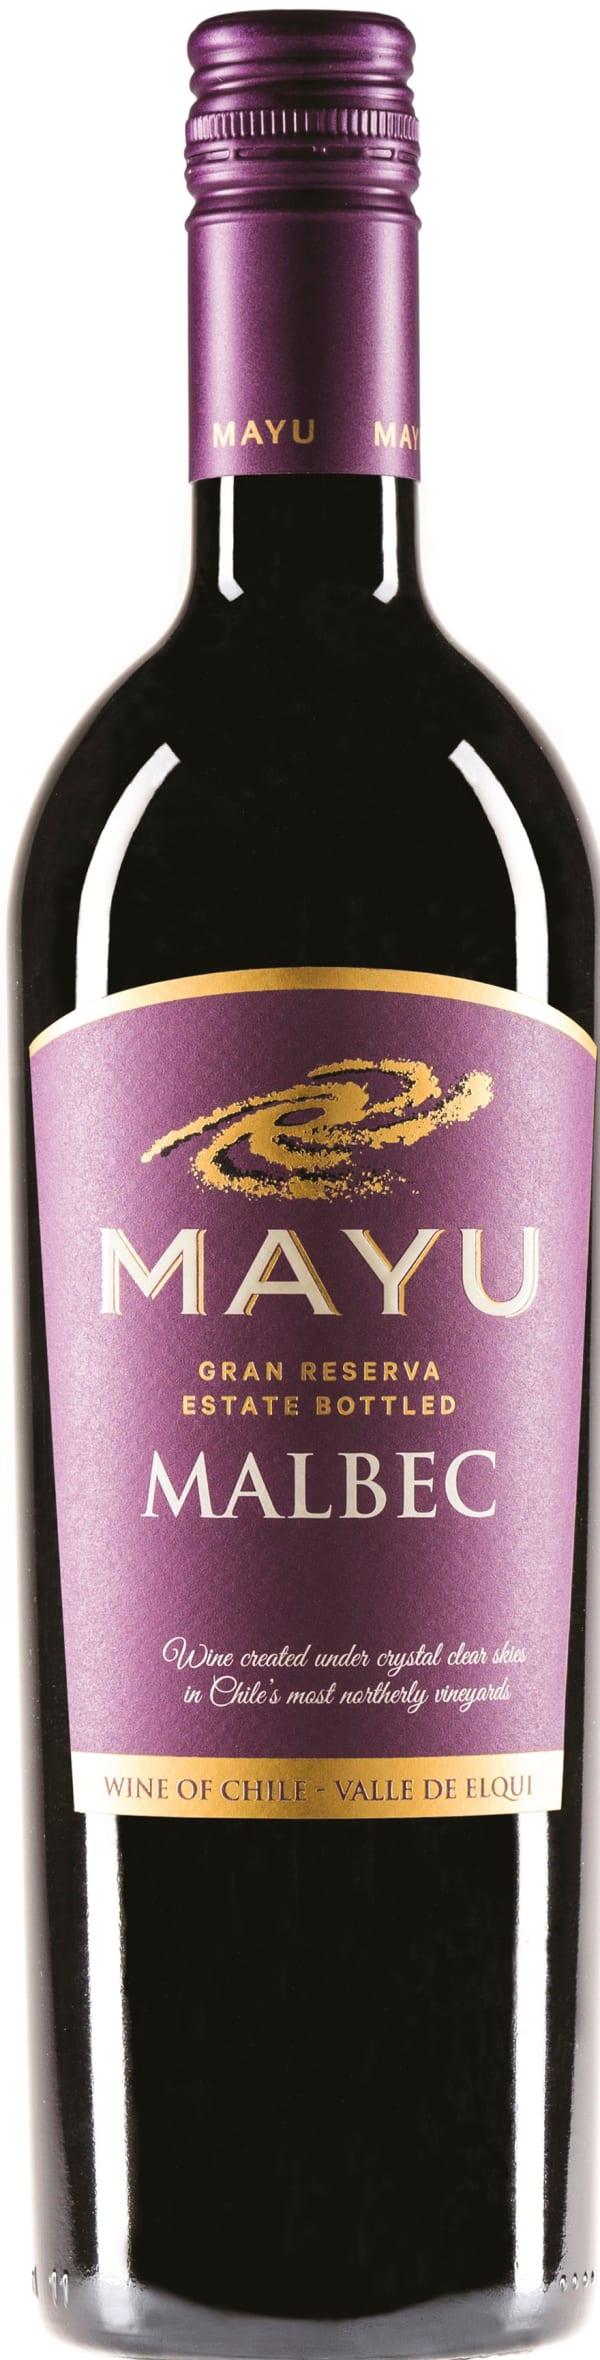 Mayu Gran Reserva Malbec 2018